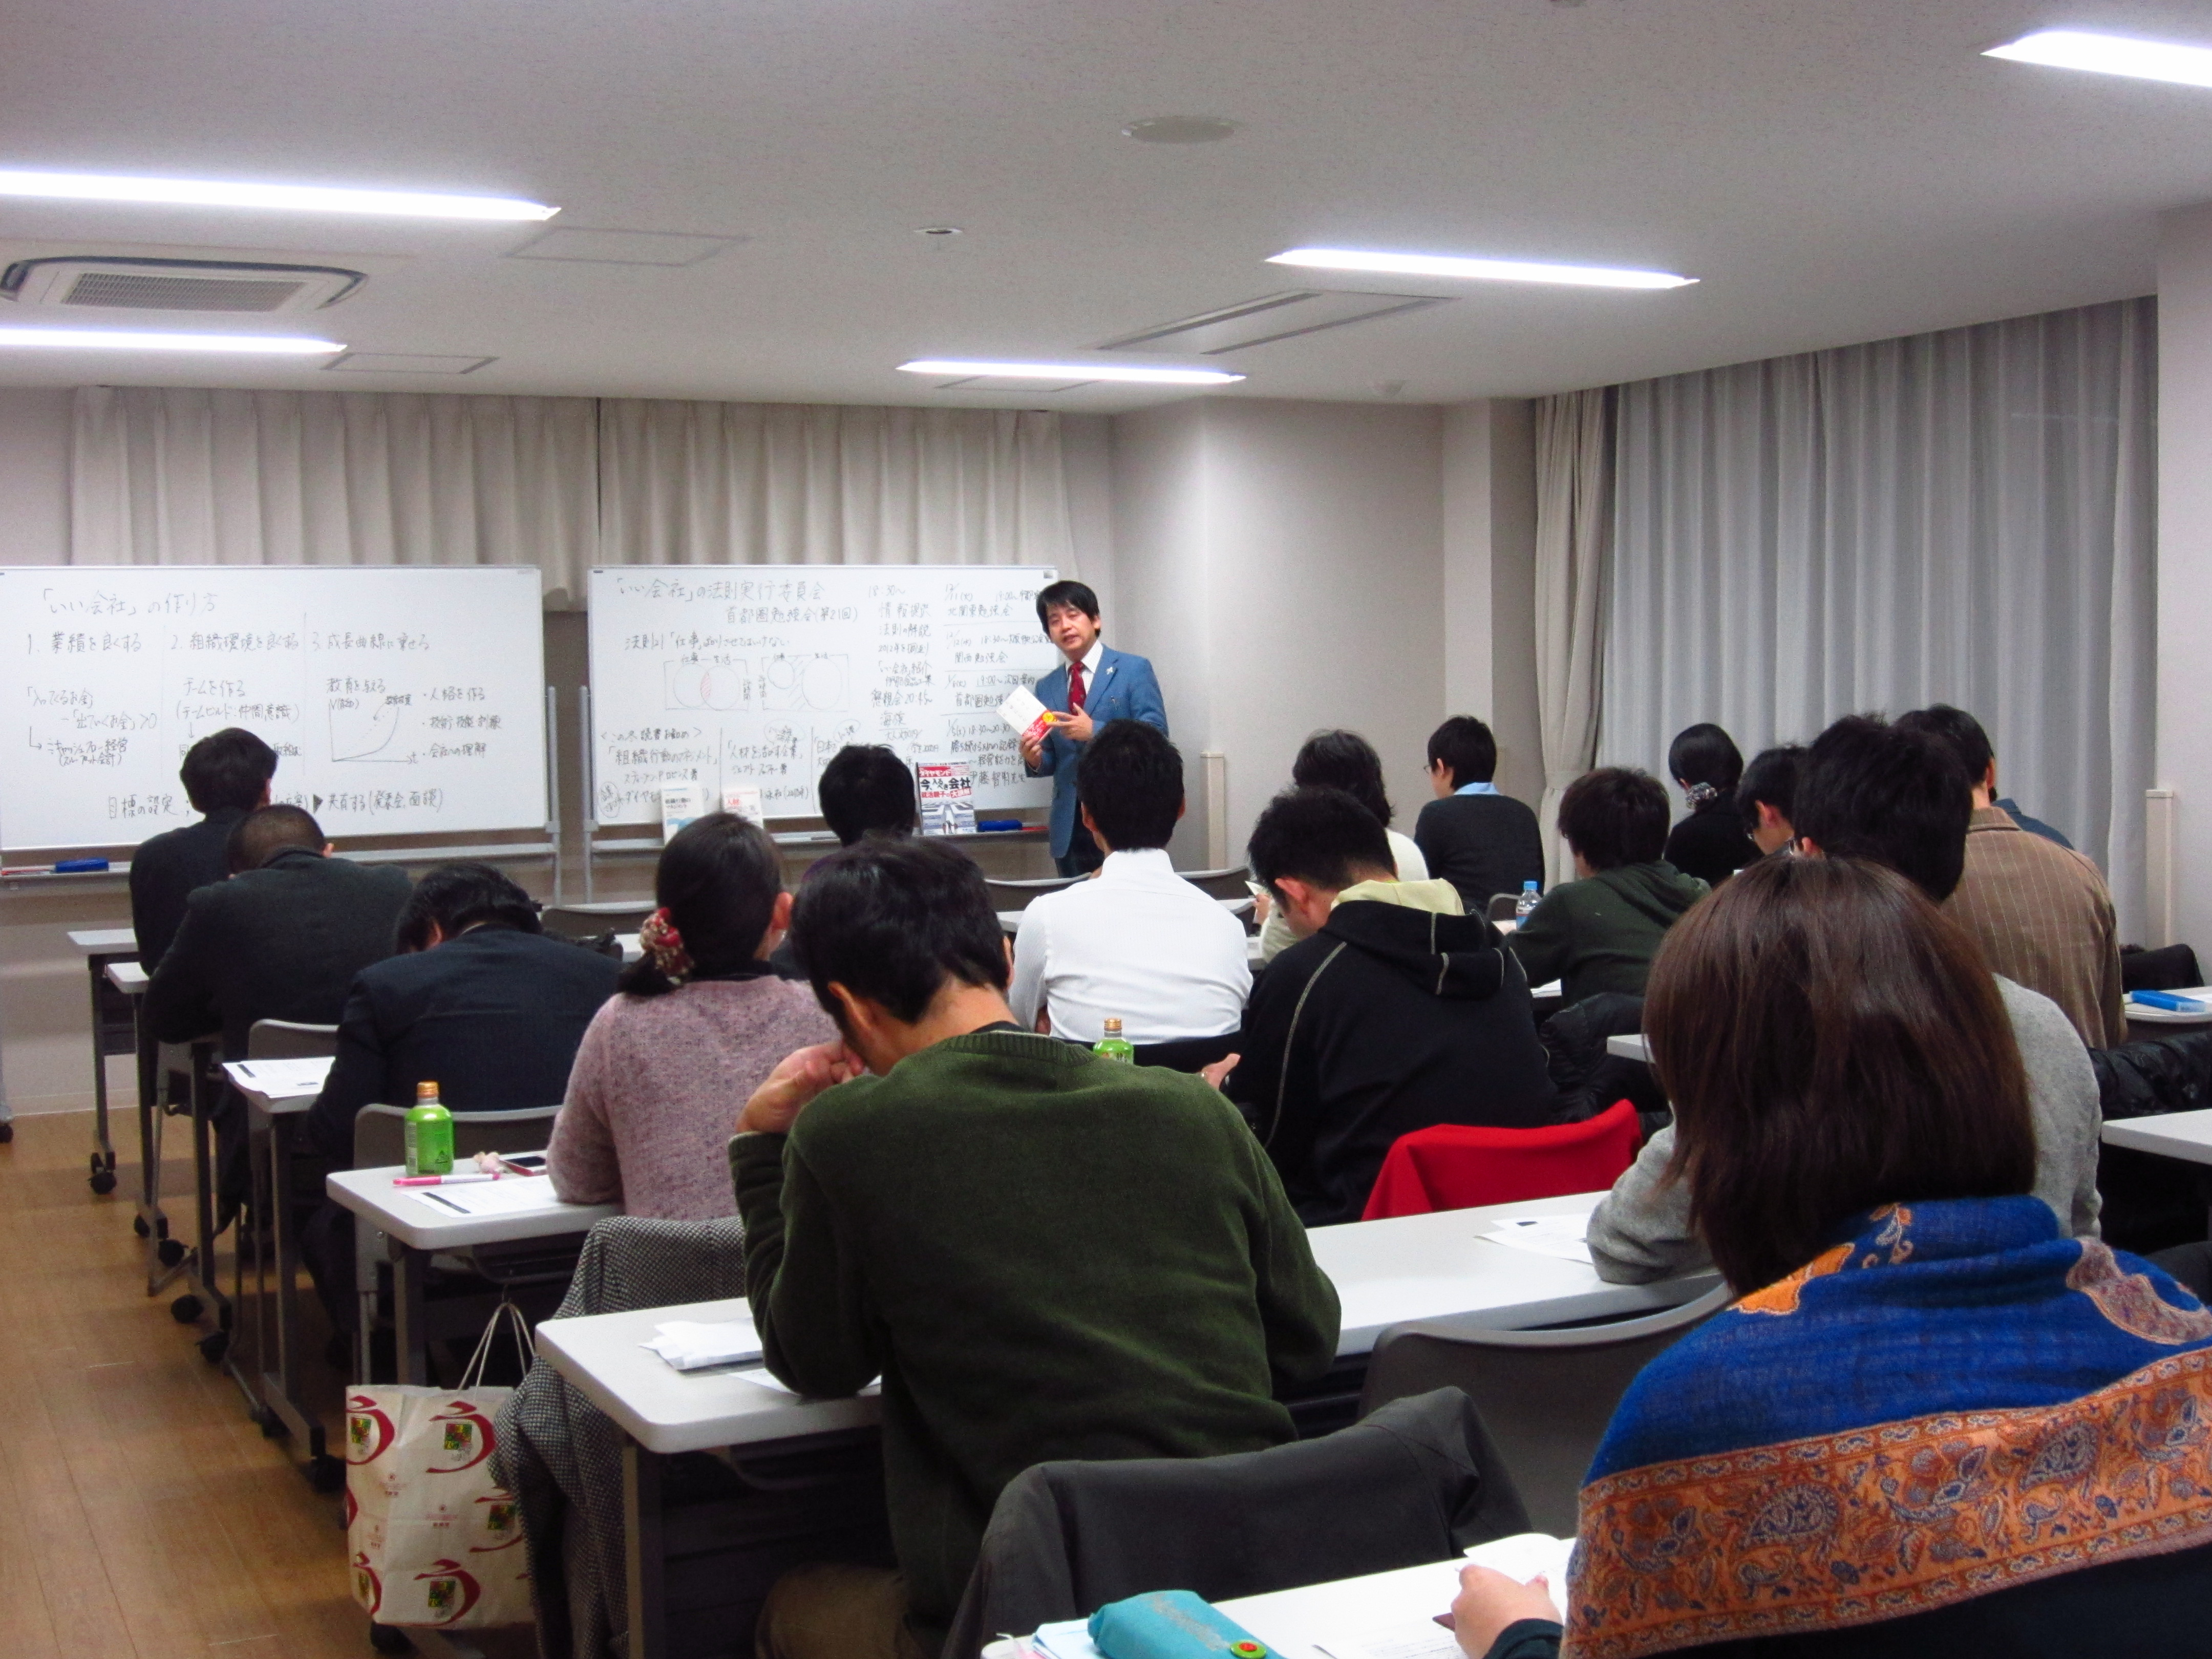 IMG 2084 - 2018年6月15日「いい会社」第74回東京首都圏勉強会